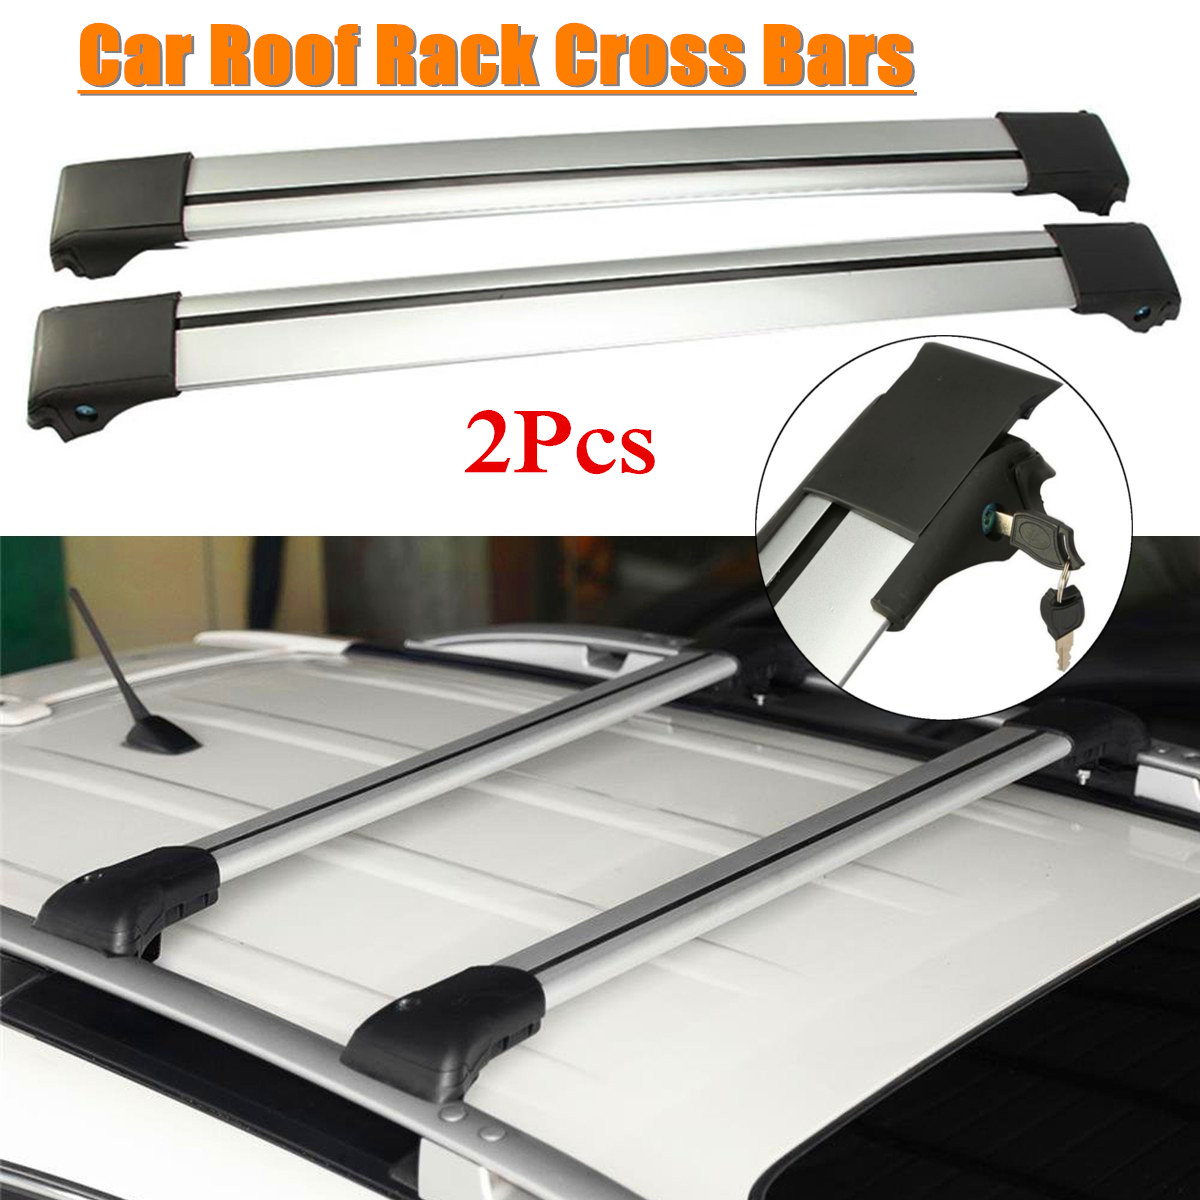 2Pcs Universal Car Roof Rack Cross Bar Luggage Carrier For Raised Rail 93 99mm